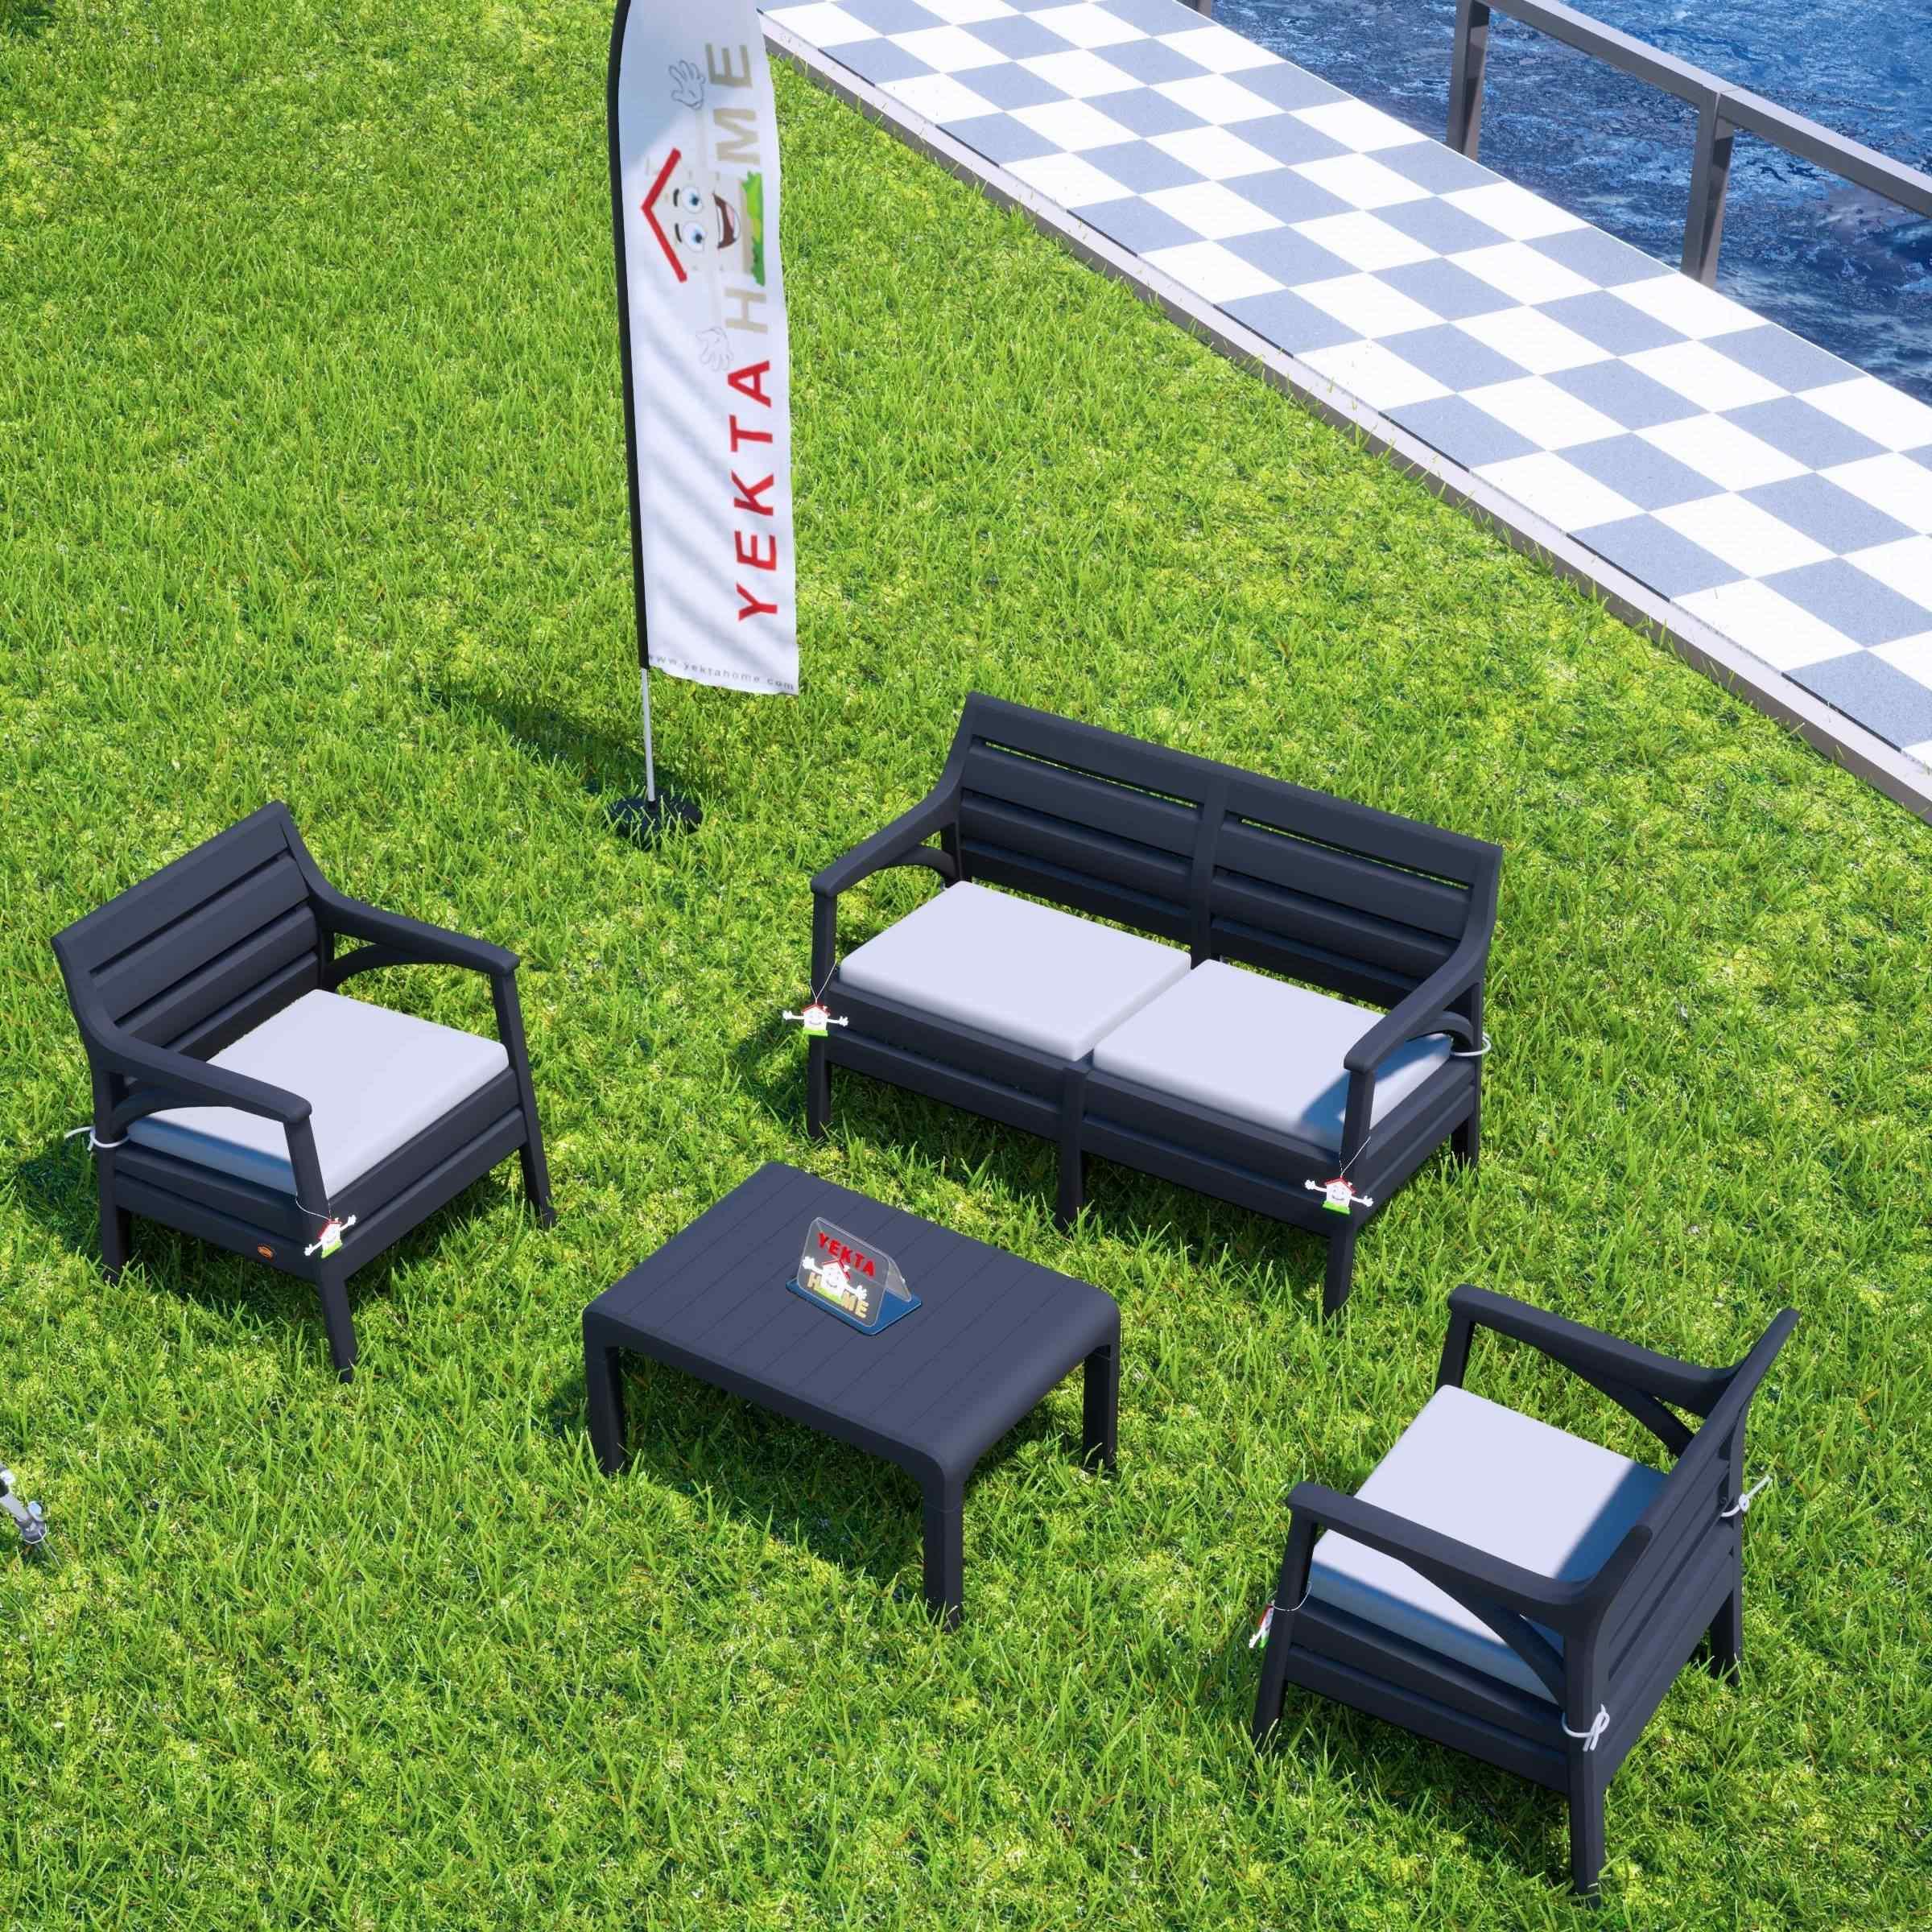 Holiday Miami Bahçe Takımı Balkon Seti Bahçe Mobilyası Antrasit